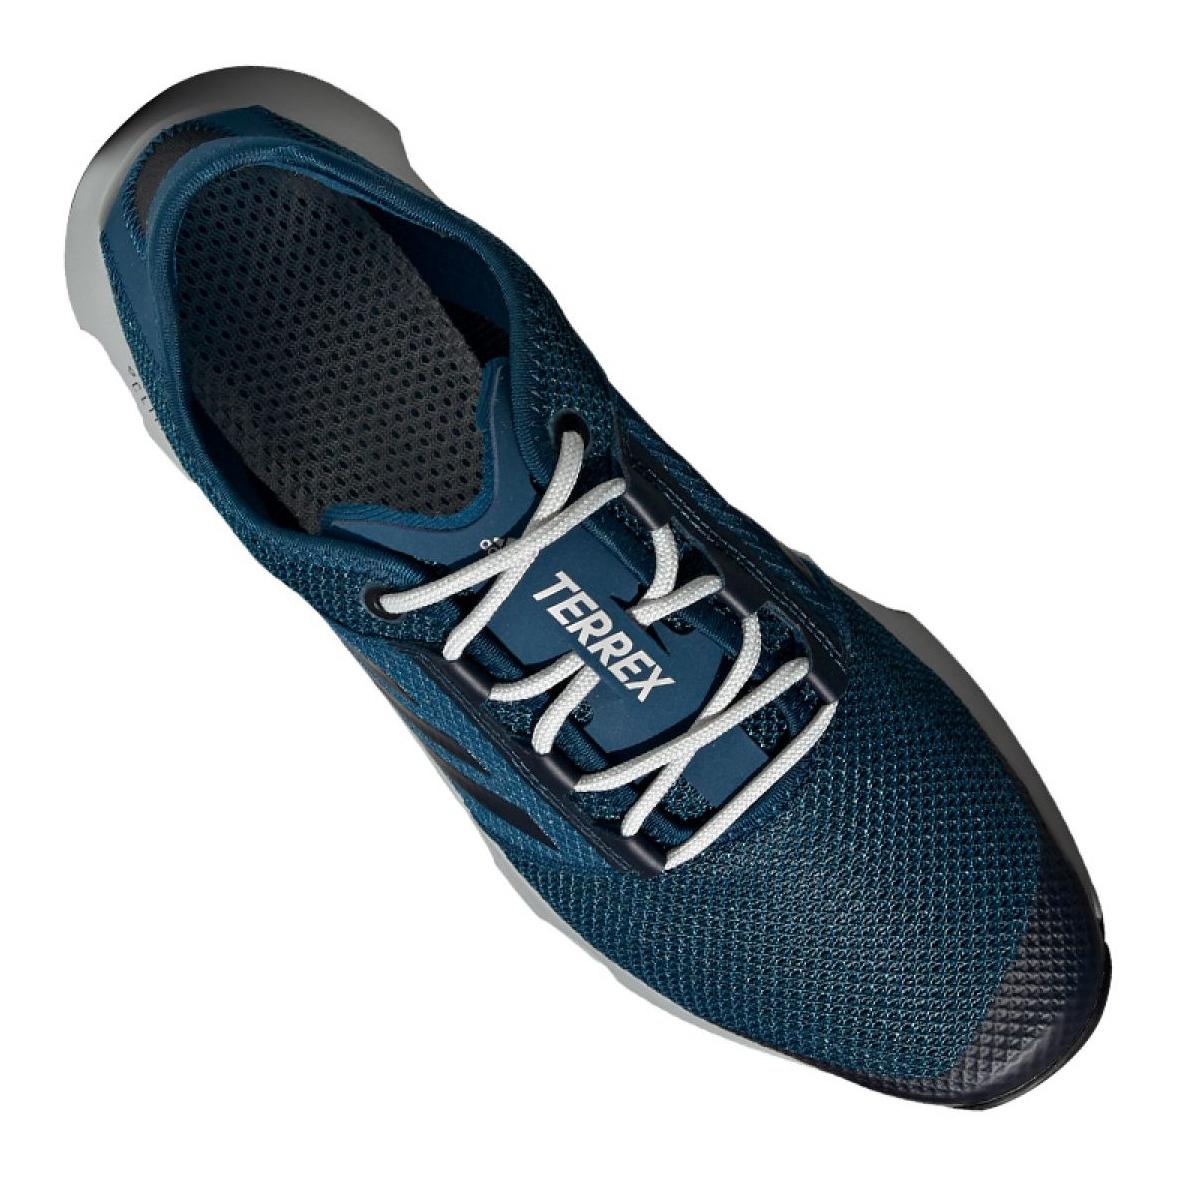 quality design 625c2 60ffb Adidas Terrex Cc Voyager M BC0447 shoes